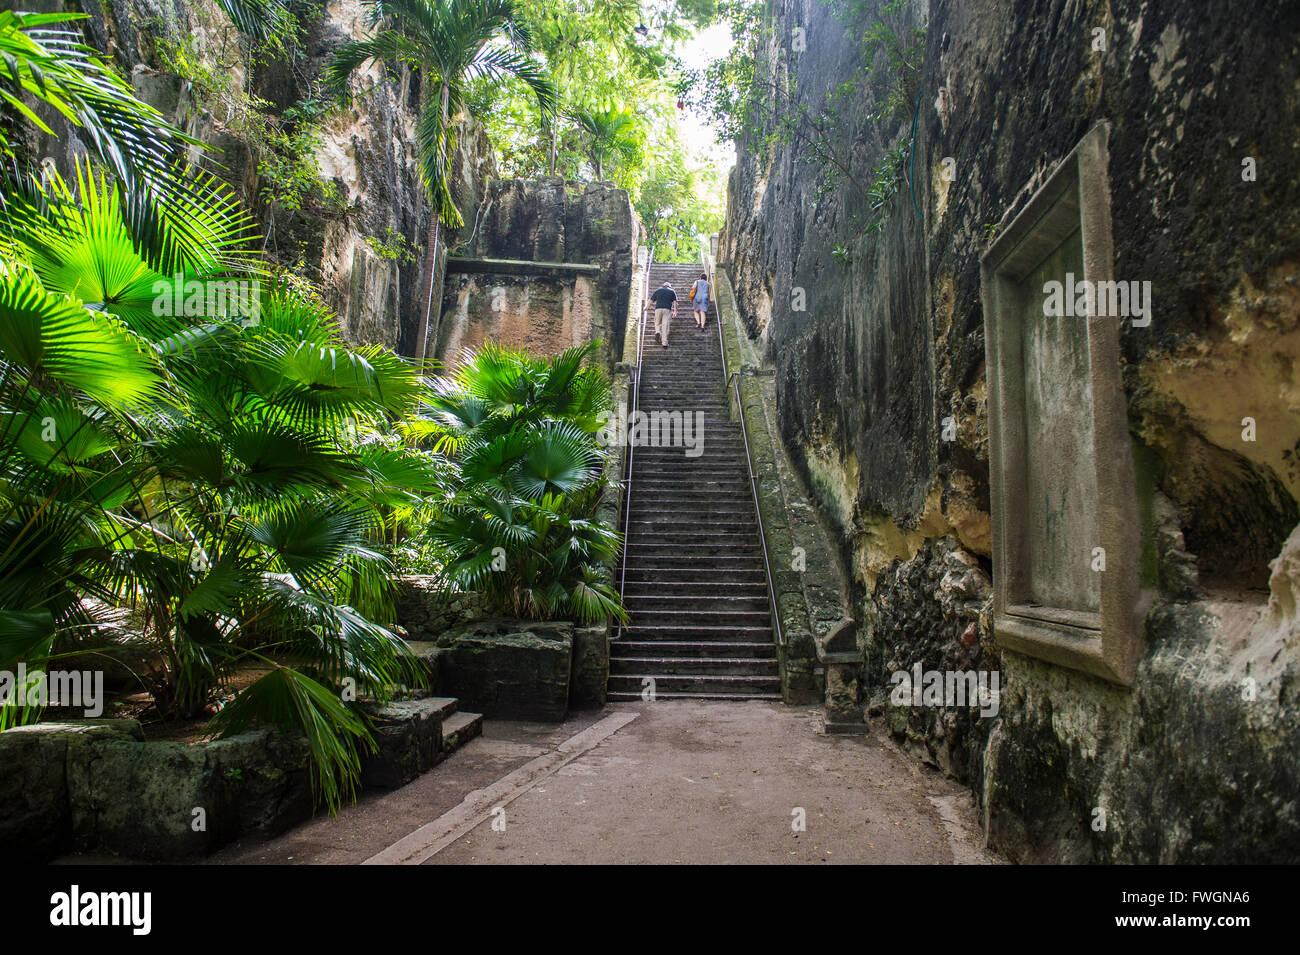 Queen's StaircaseNassau, New Providence, Bahamas, Caribbean - Stock Image